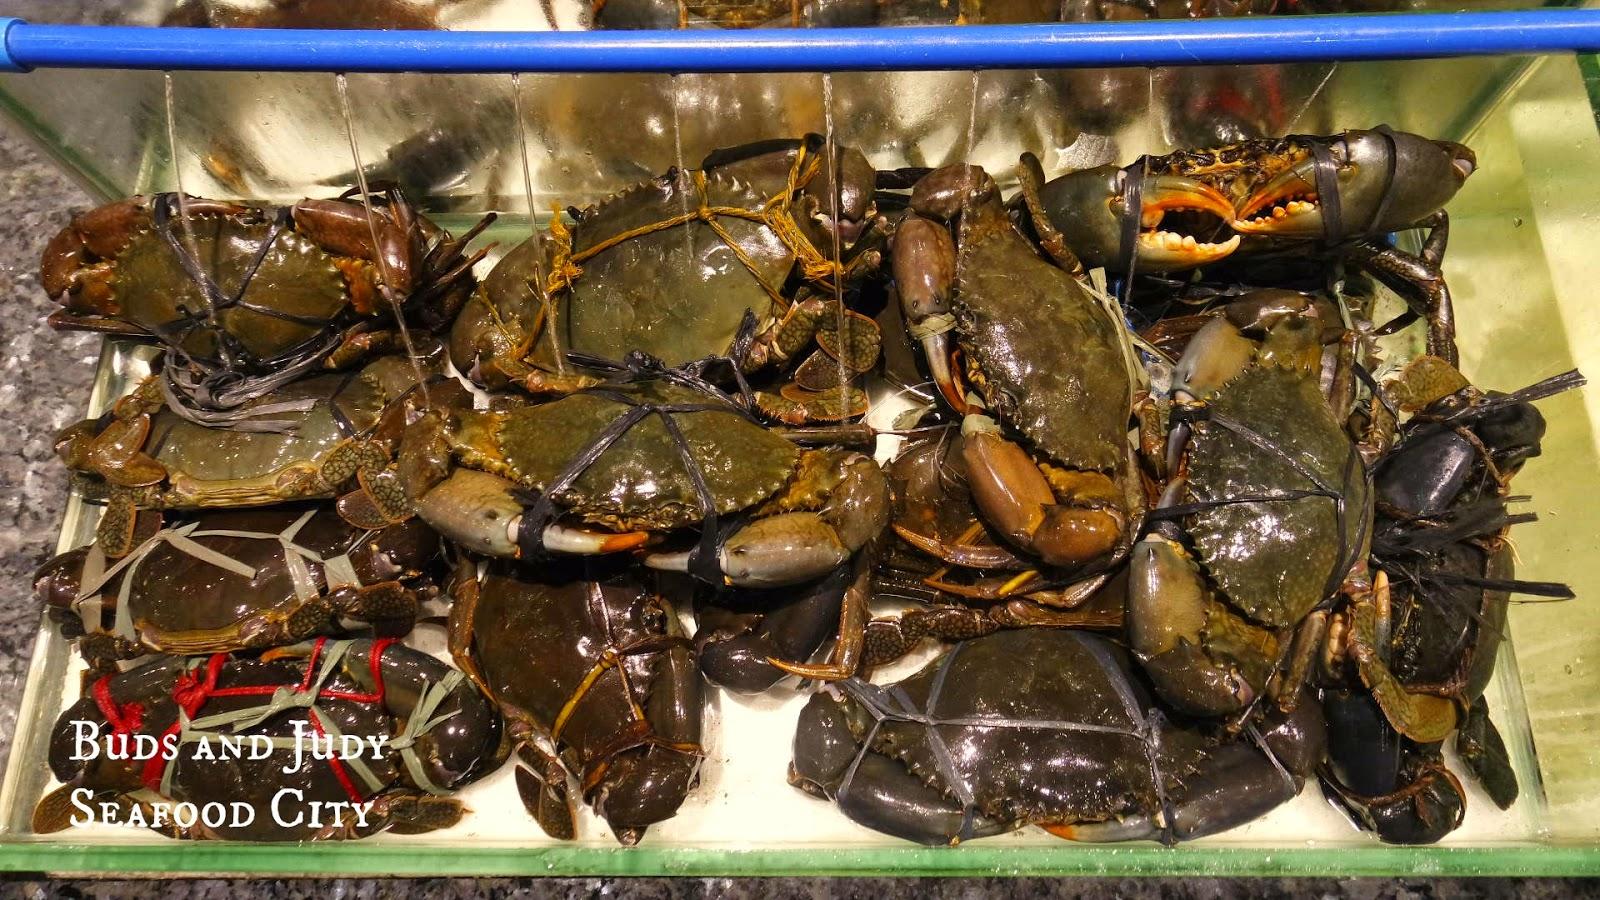 Seafood City. Seafood Restaurant in Cebu City. Crabs